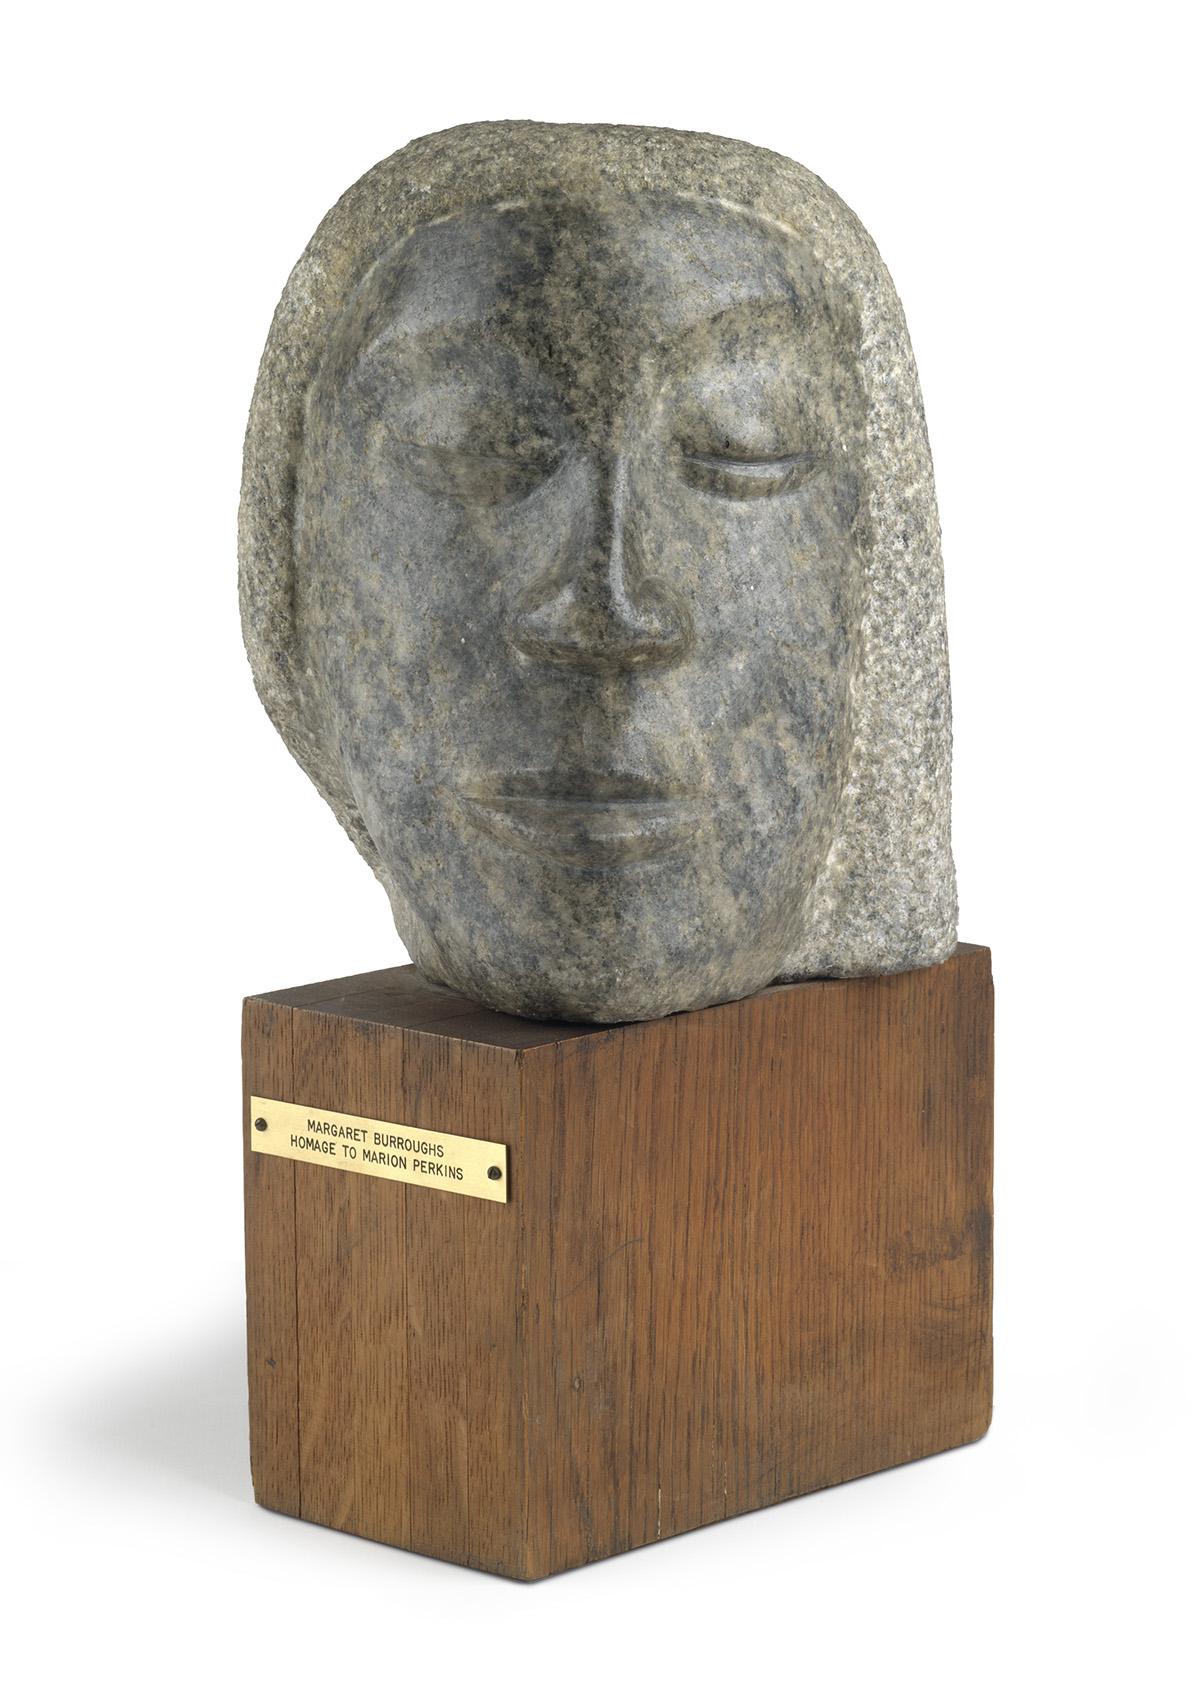 MARGARET BURROUGHS (1915 - 2010) Homage to Marion Perkins.